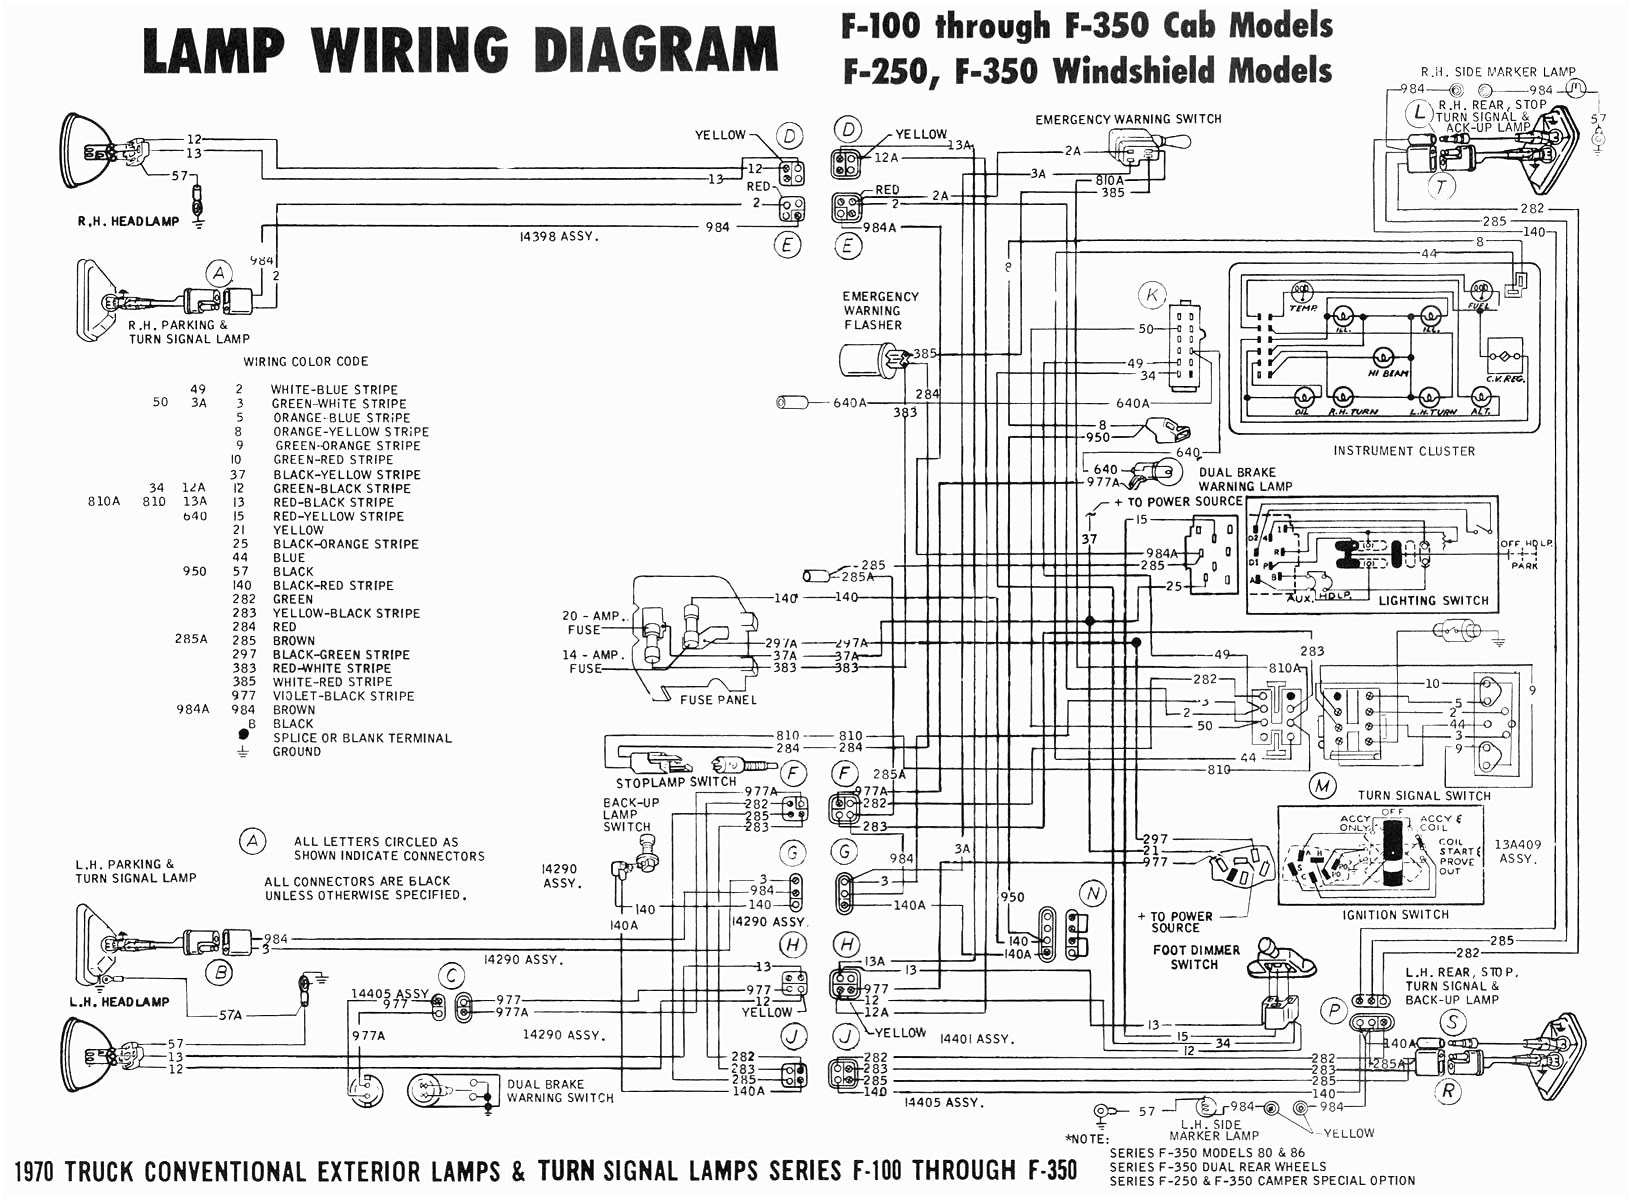 underwater camera flash circuit diagram tradeoficcom wiring doubler for 1 hz to 12 mhz circuit diagram